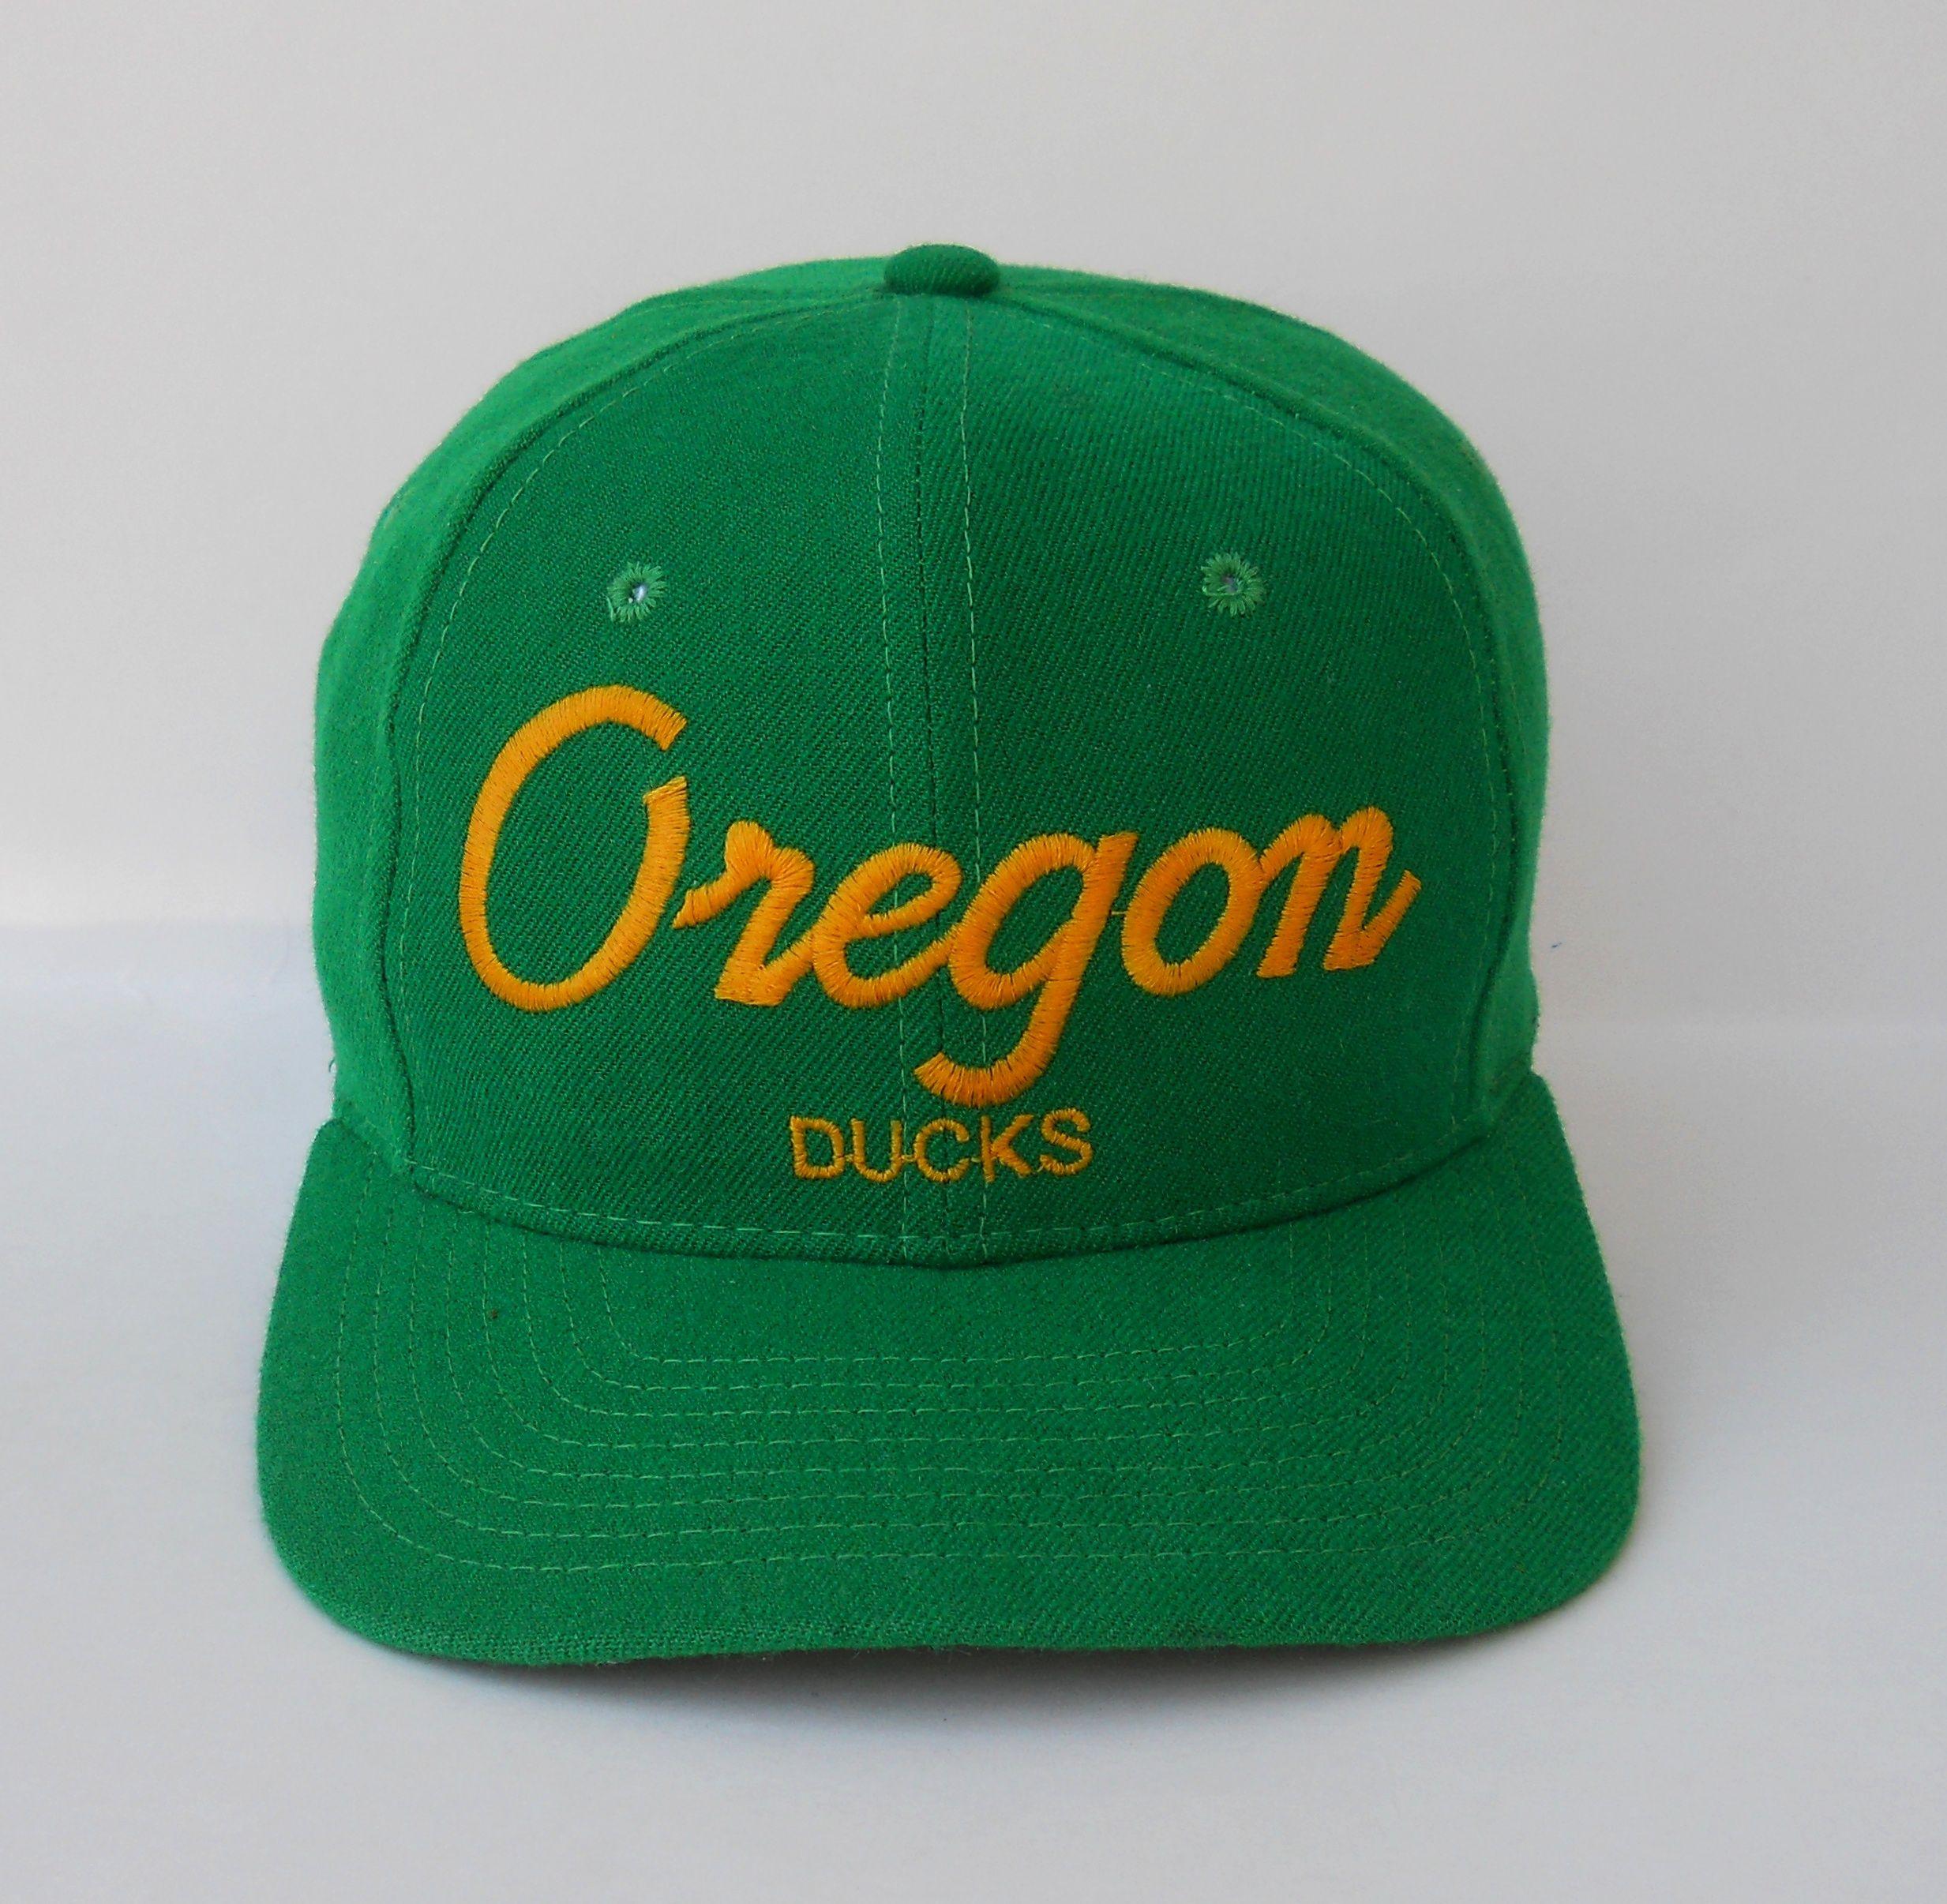 super popular a2701 b8787 ... ncaa snapback hat baseball cap ab867 6d84a  where to buy vintage circa  89 90 oregon ducks sports specialties the pro snapback pre 27838